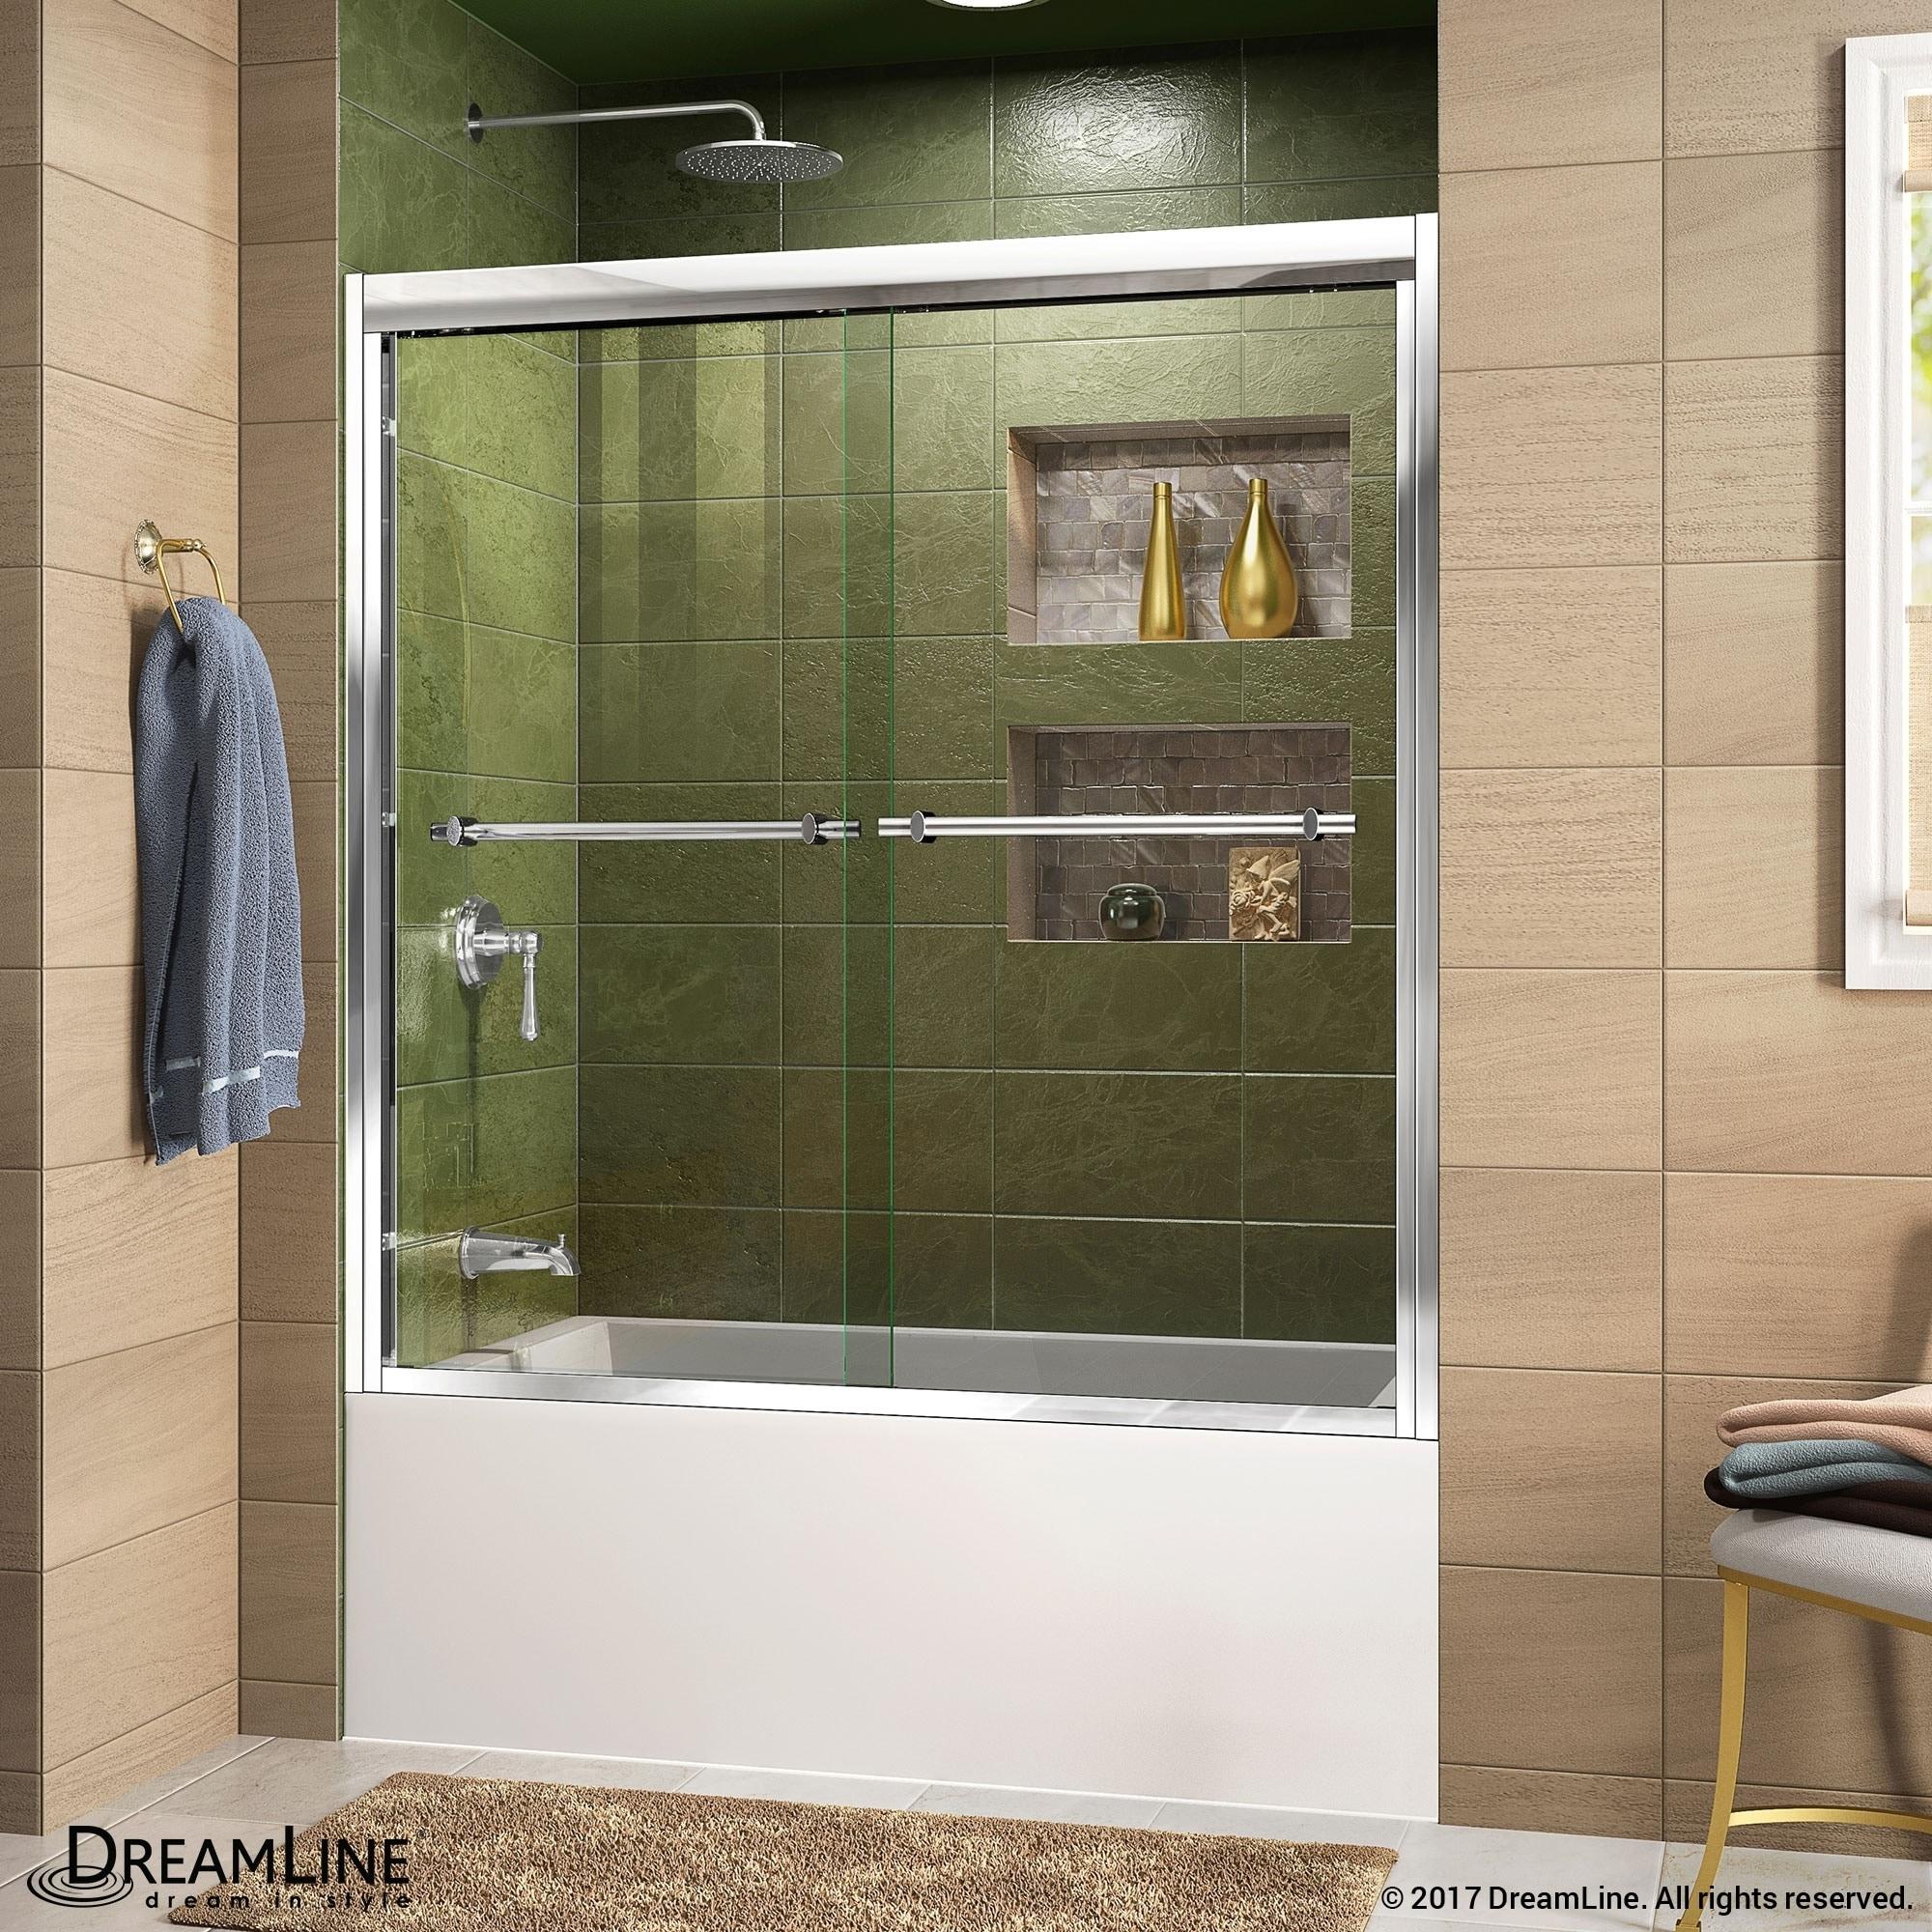 Shop Dreamline Duet 55 59 In W X 58 In H Bypass Sliding Tub Door